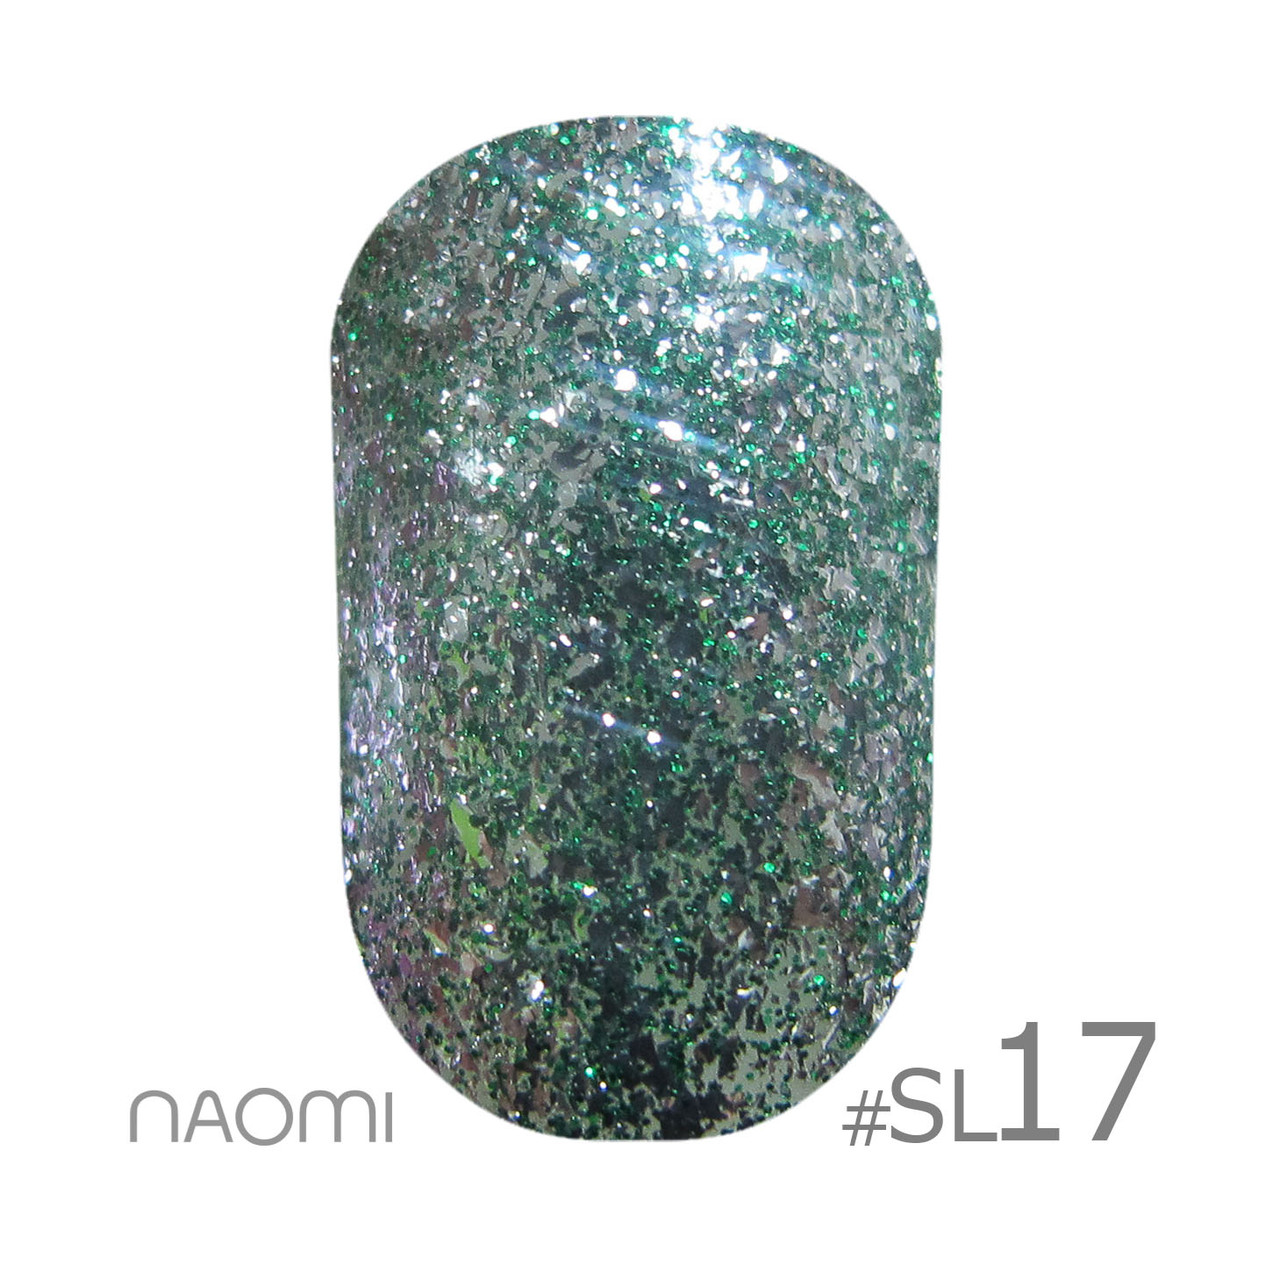 Гель-лак для нігтів 6 мл Naomi Self Illuminated Collection SI 17